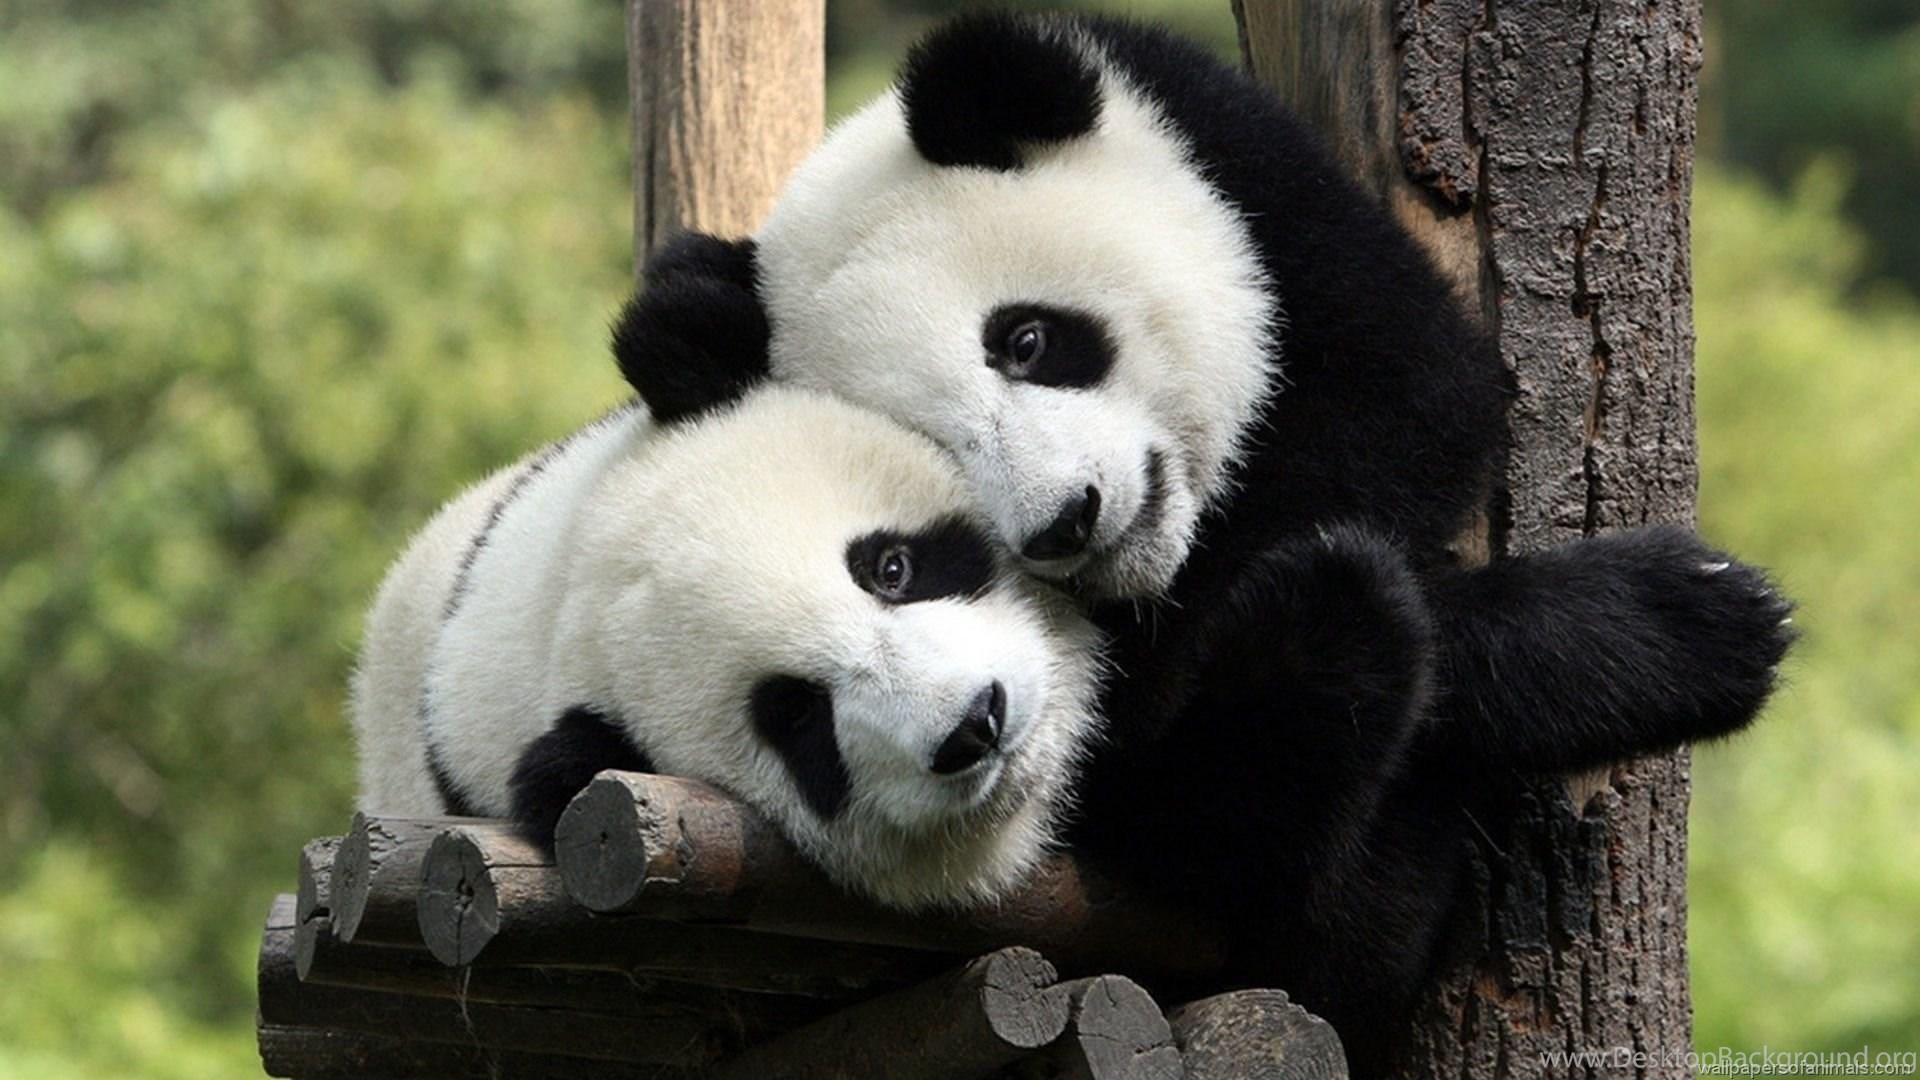 Cute Panda Wallpapers HD CuteWallpaperorg Desktop Background